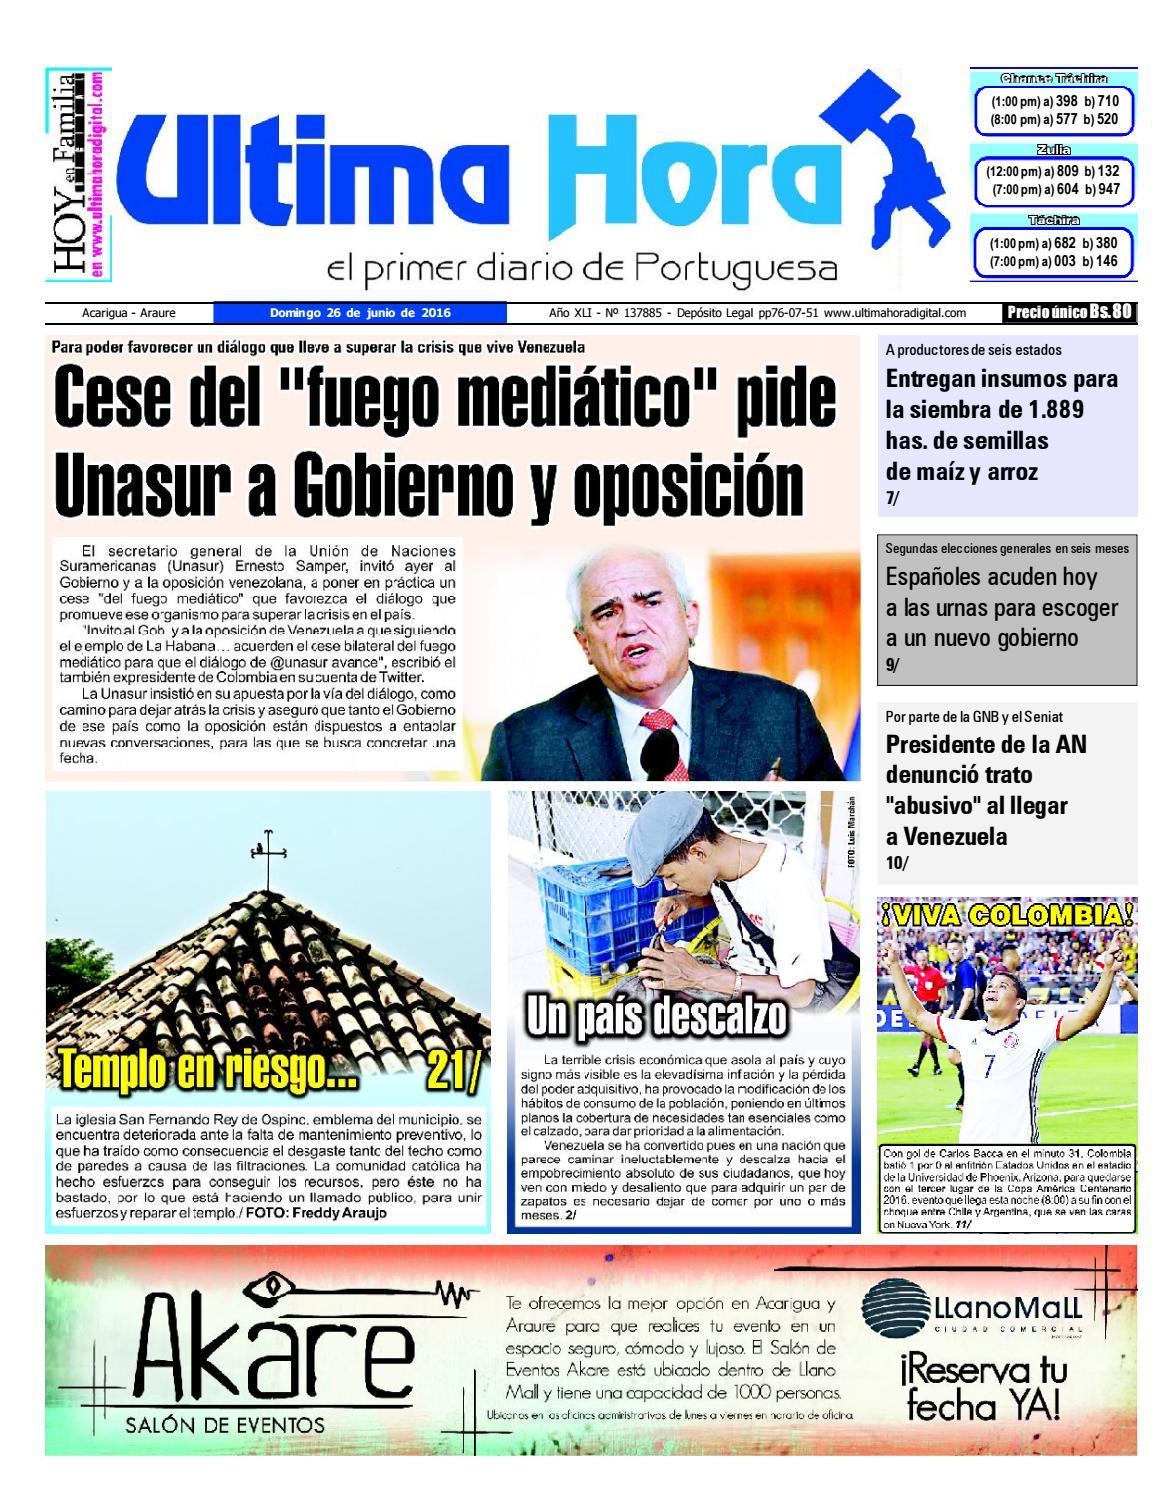 Muebles Castro Tovar Toral Vados - Edici N 26 06 2016 By Ultima Hora El Primer Diario De Portuguesa [mjhdah]https://leonsano.files.wordpress.com/2015/08/vc3afnculo-a-pdf-articulo-completo-expresi-dipu-entre-tute-y-tetas_pc3a1gina_11.jpg